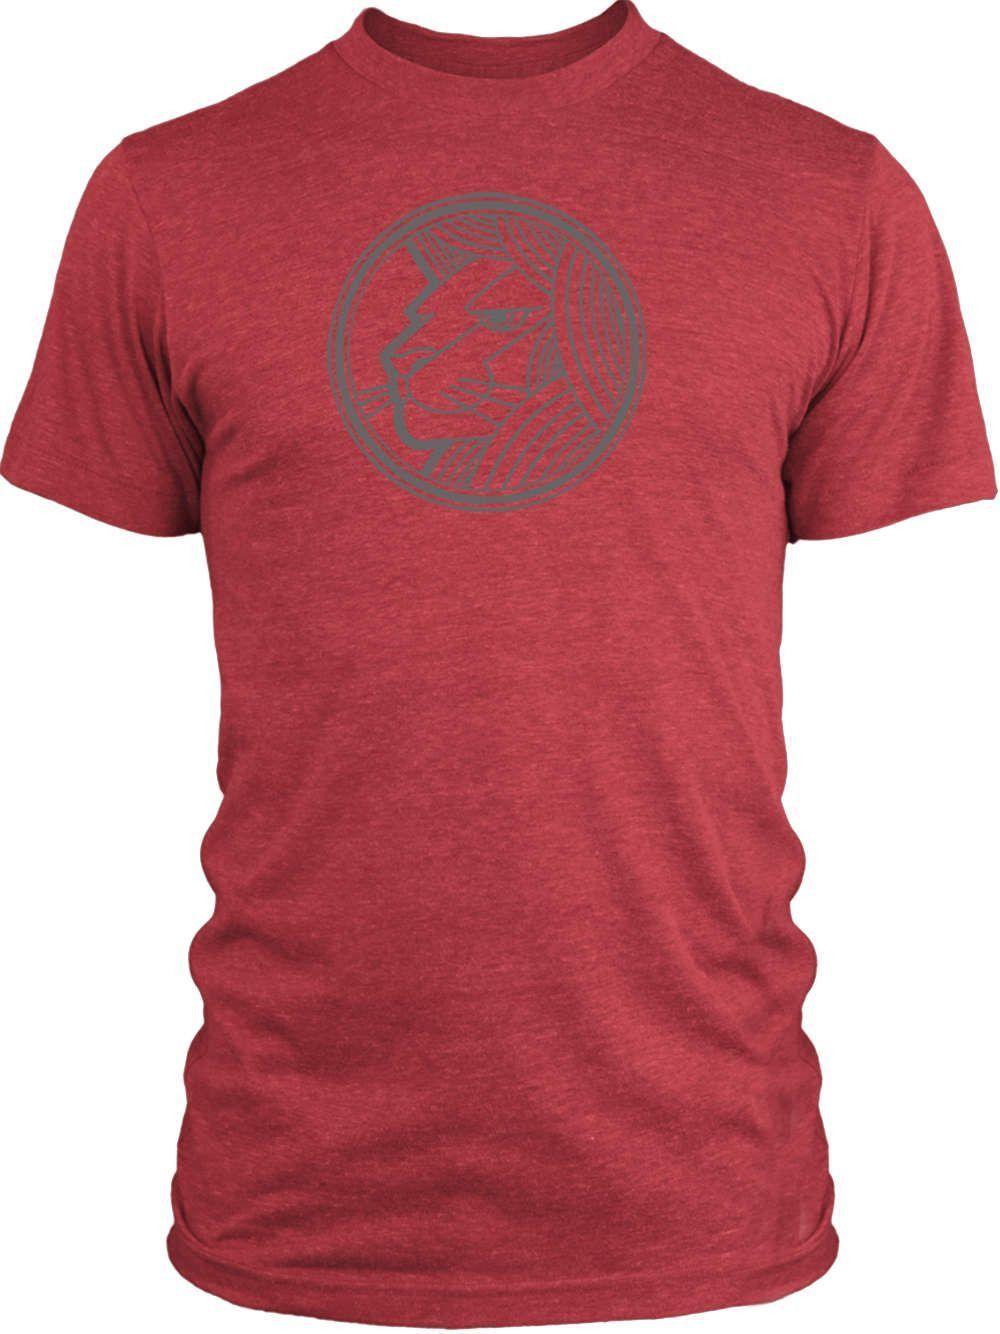 Big Texas Sign of Leo (Grey) Vintage Tri-Blend T-Shirt